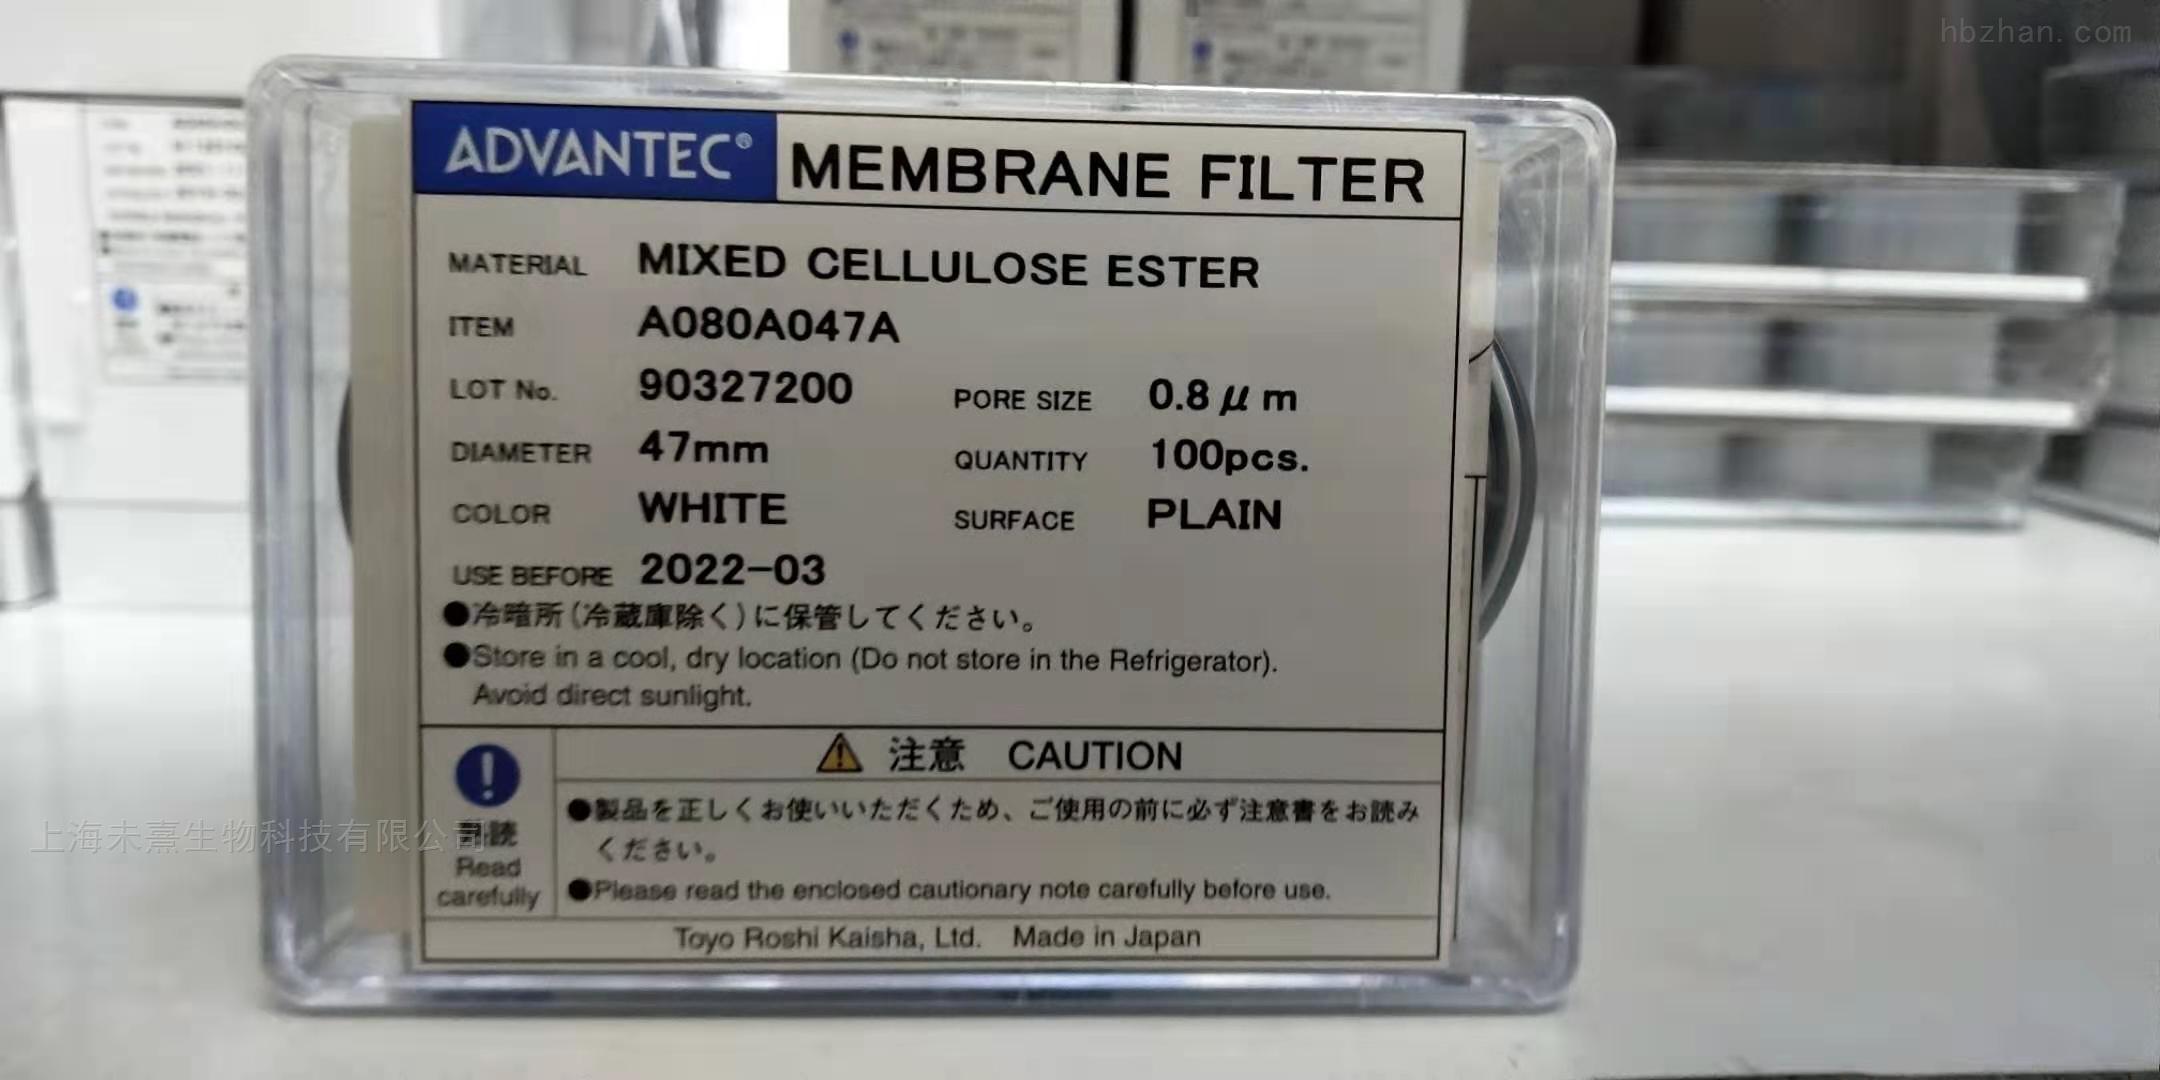 ADVANTEC孔径0.8um混合纤维素酯膜透光滤膜